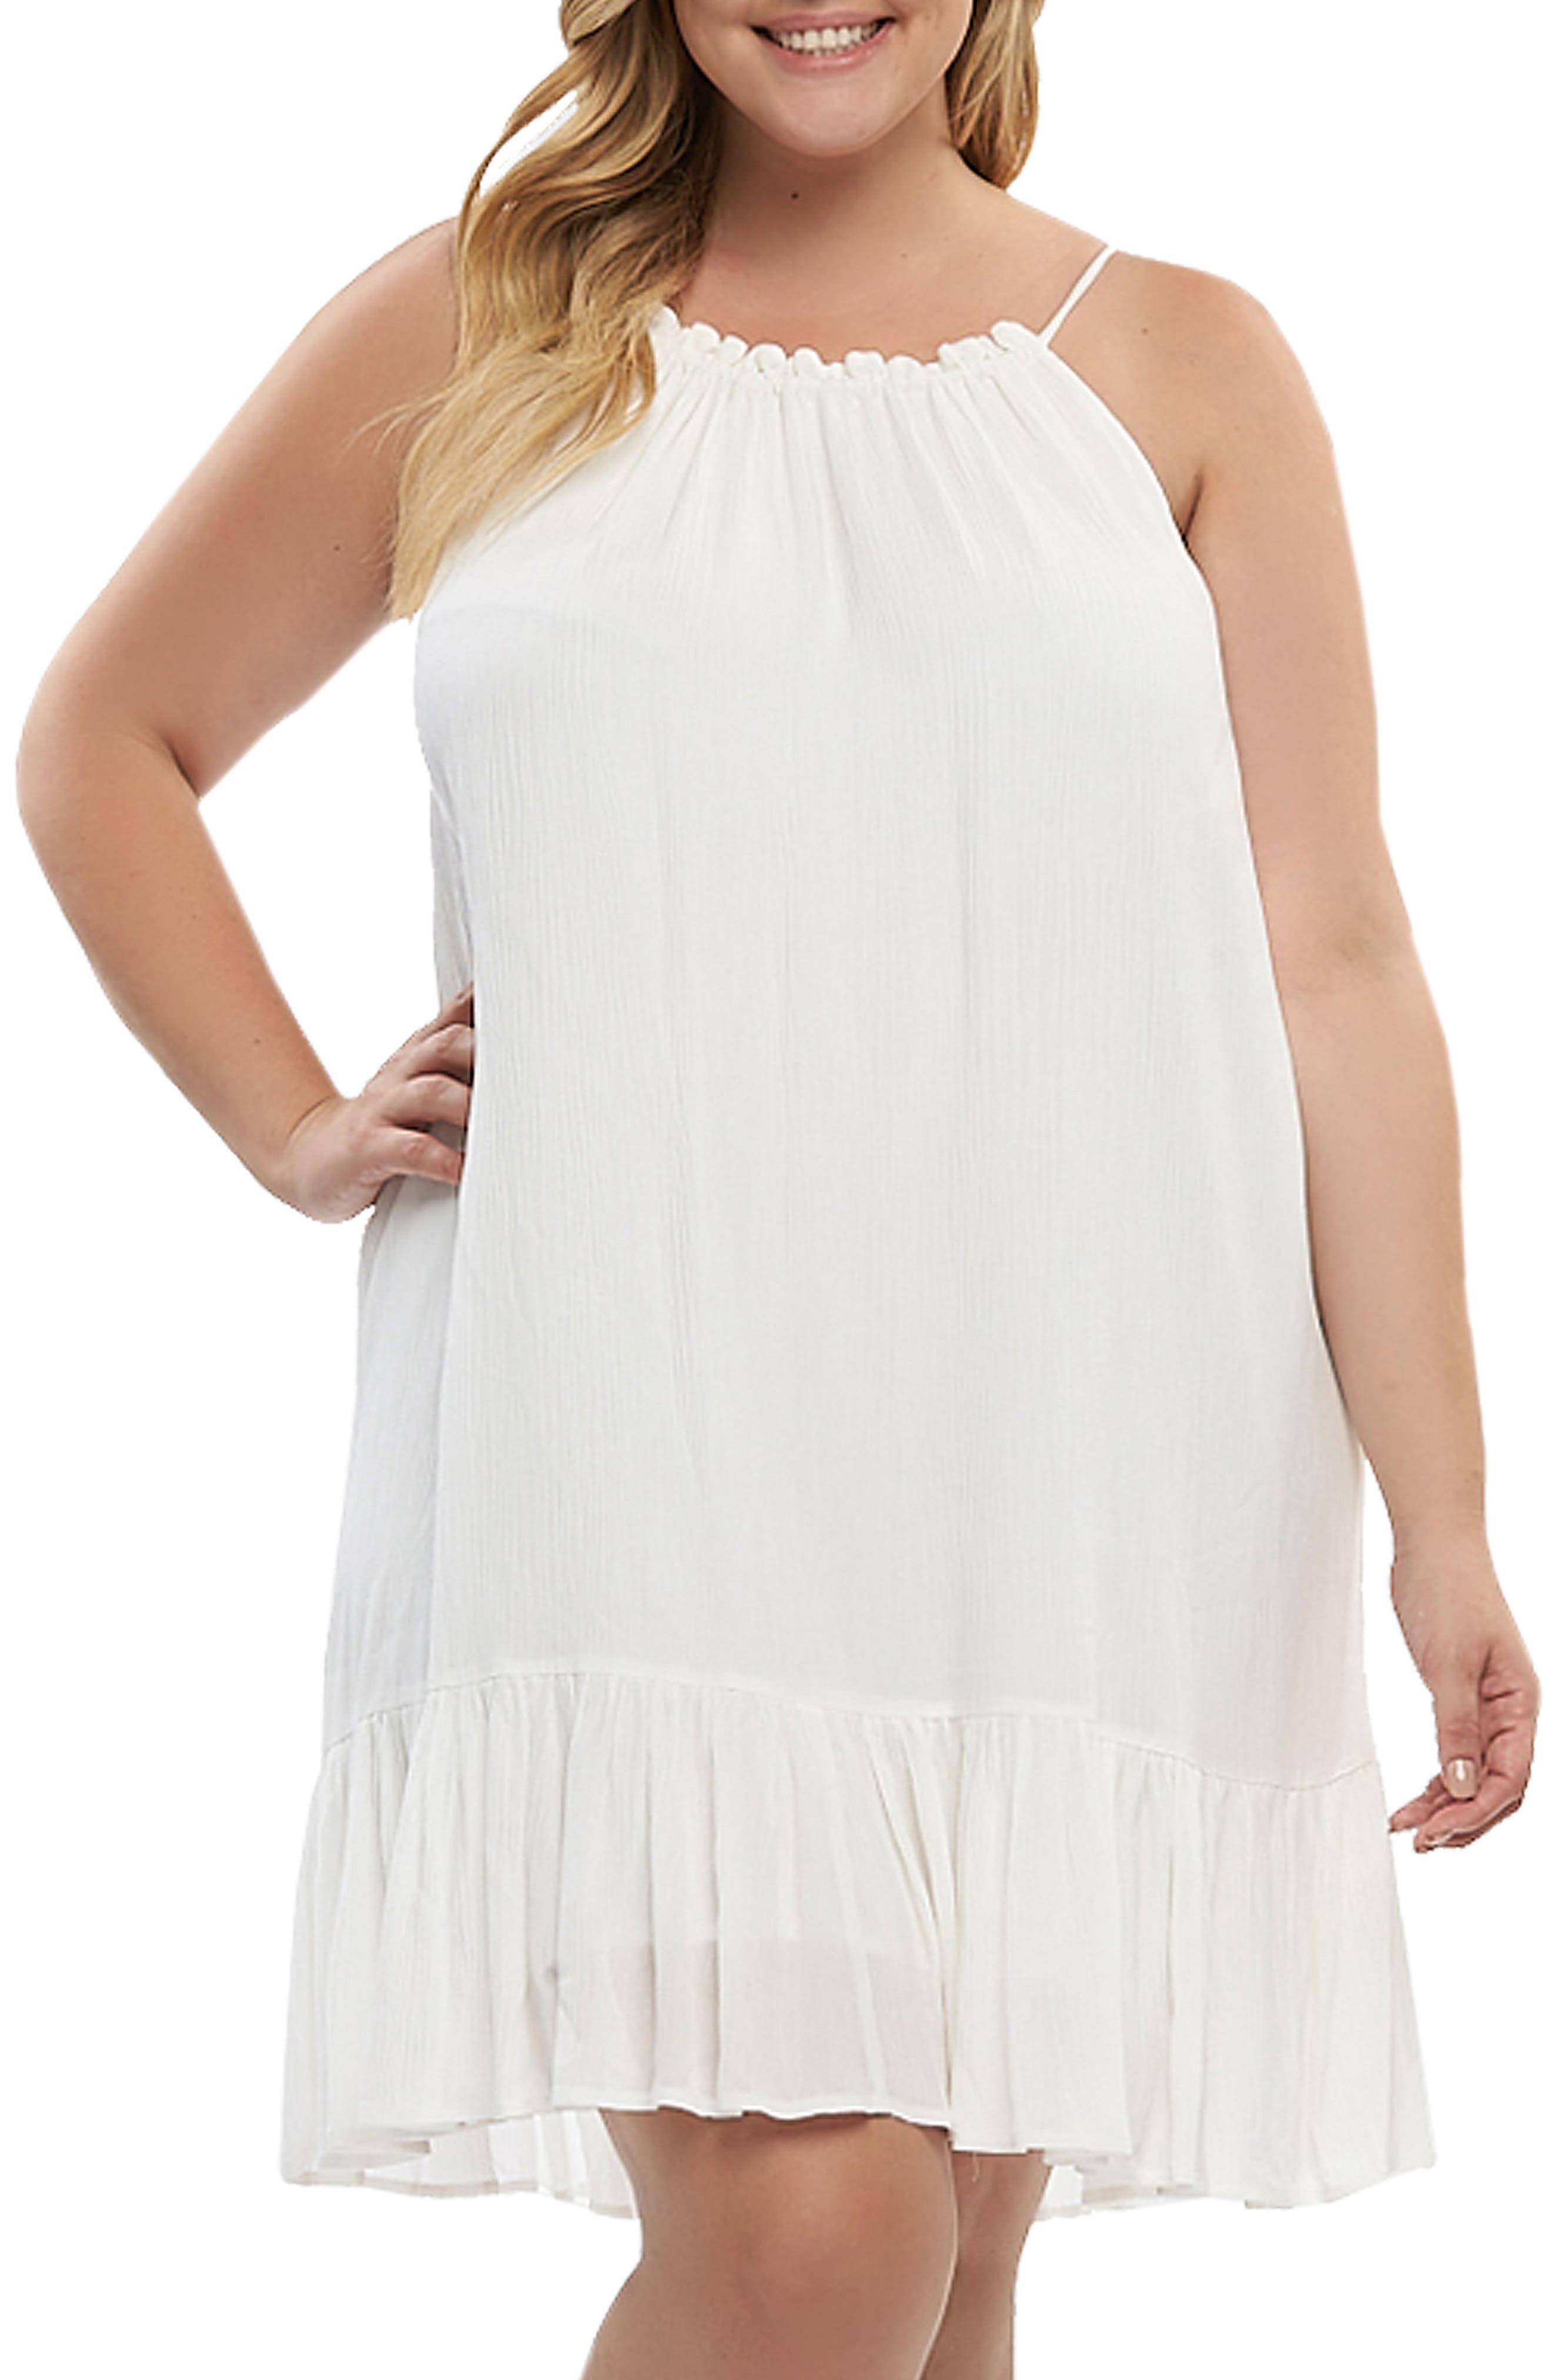 Liz Halter Top Baby Doll Dress,                         Main,                         color, White